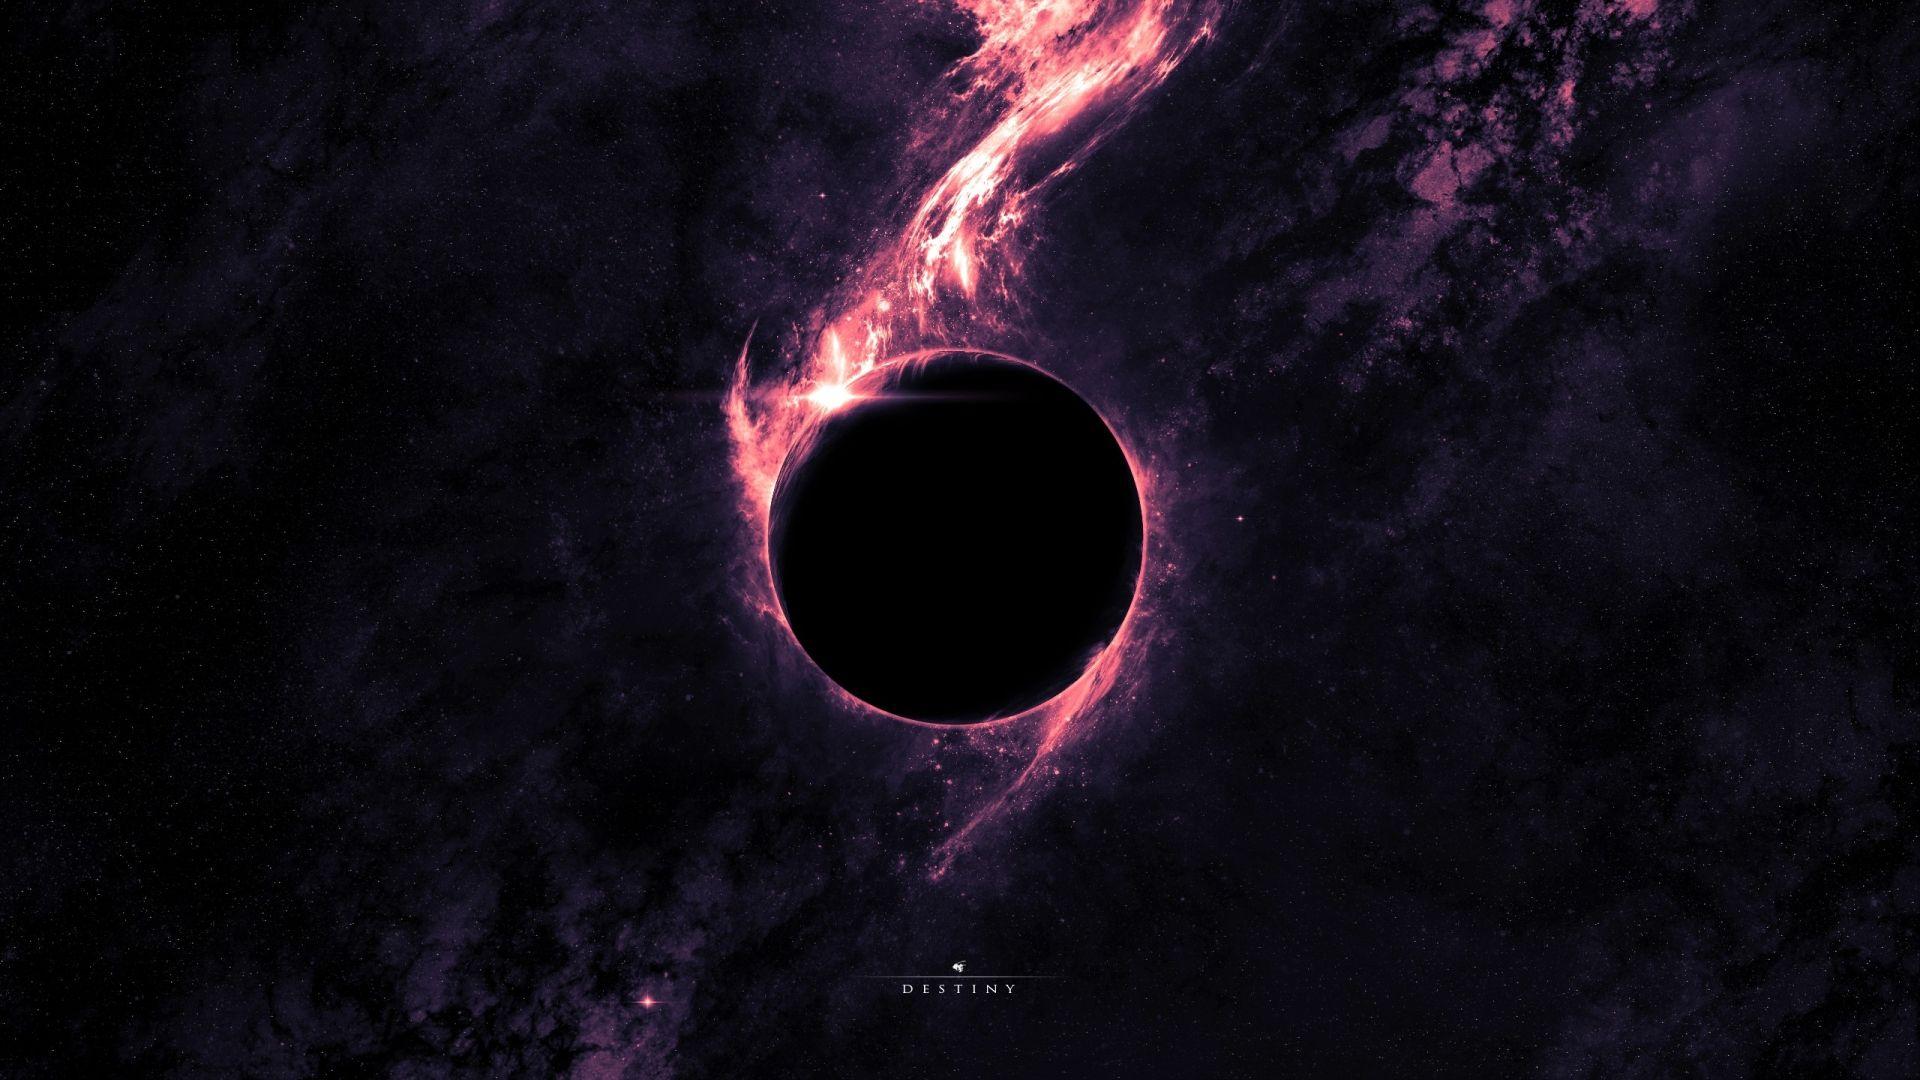 #FantasyArt #Planet #Eclipse #Space #Wallpaper